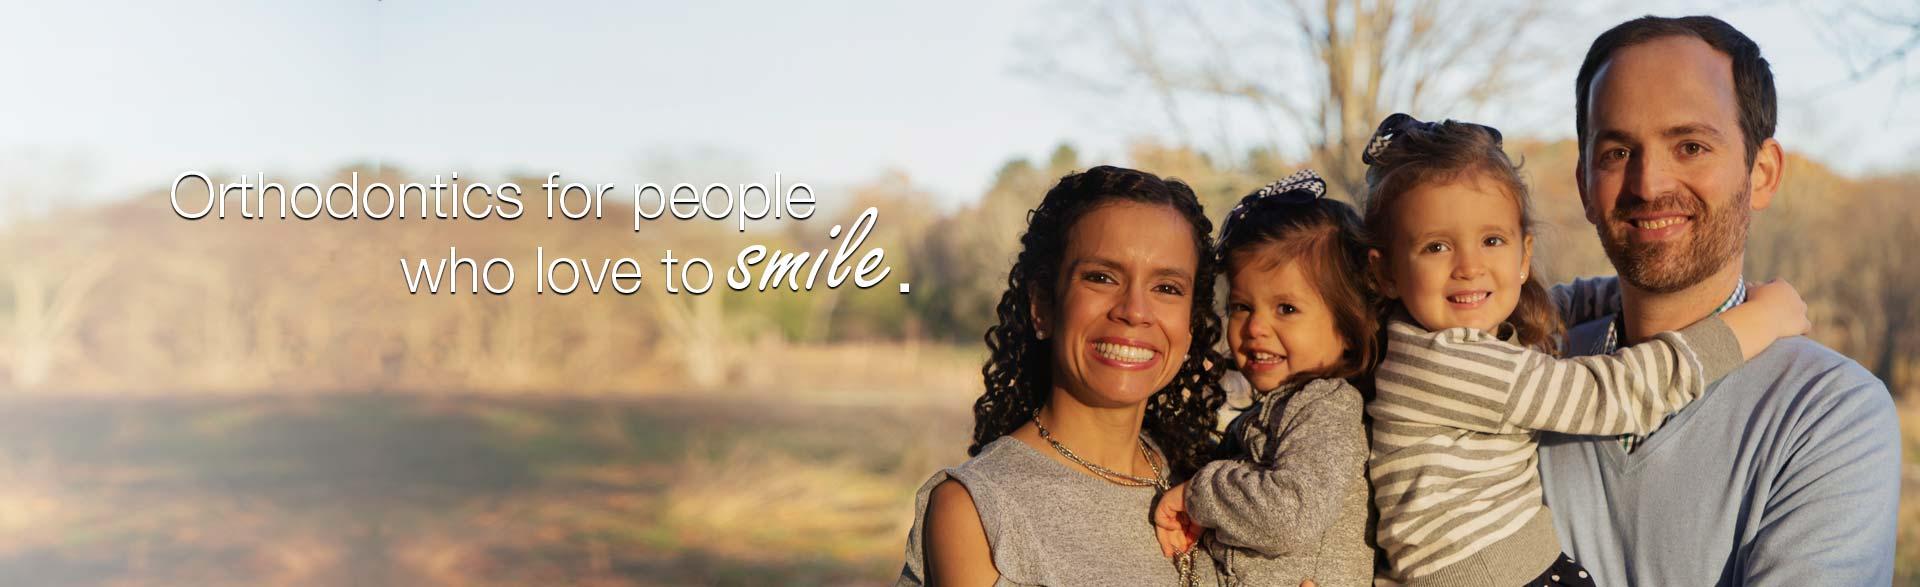 Dr-Daniela-Toro-Family at-Burlington-Orthodontics-in-Burlington-MA